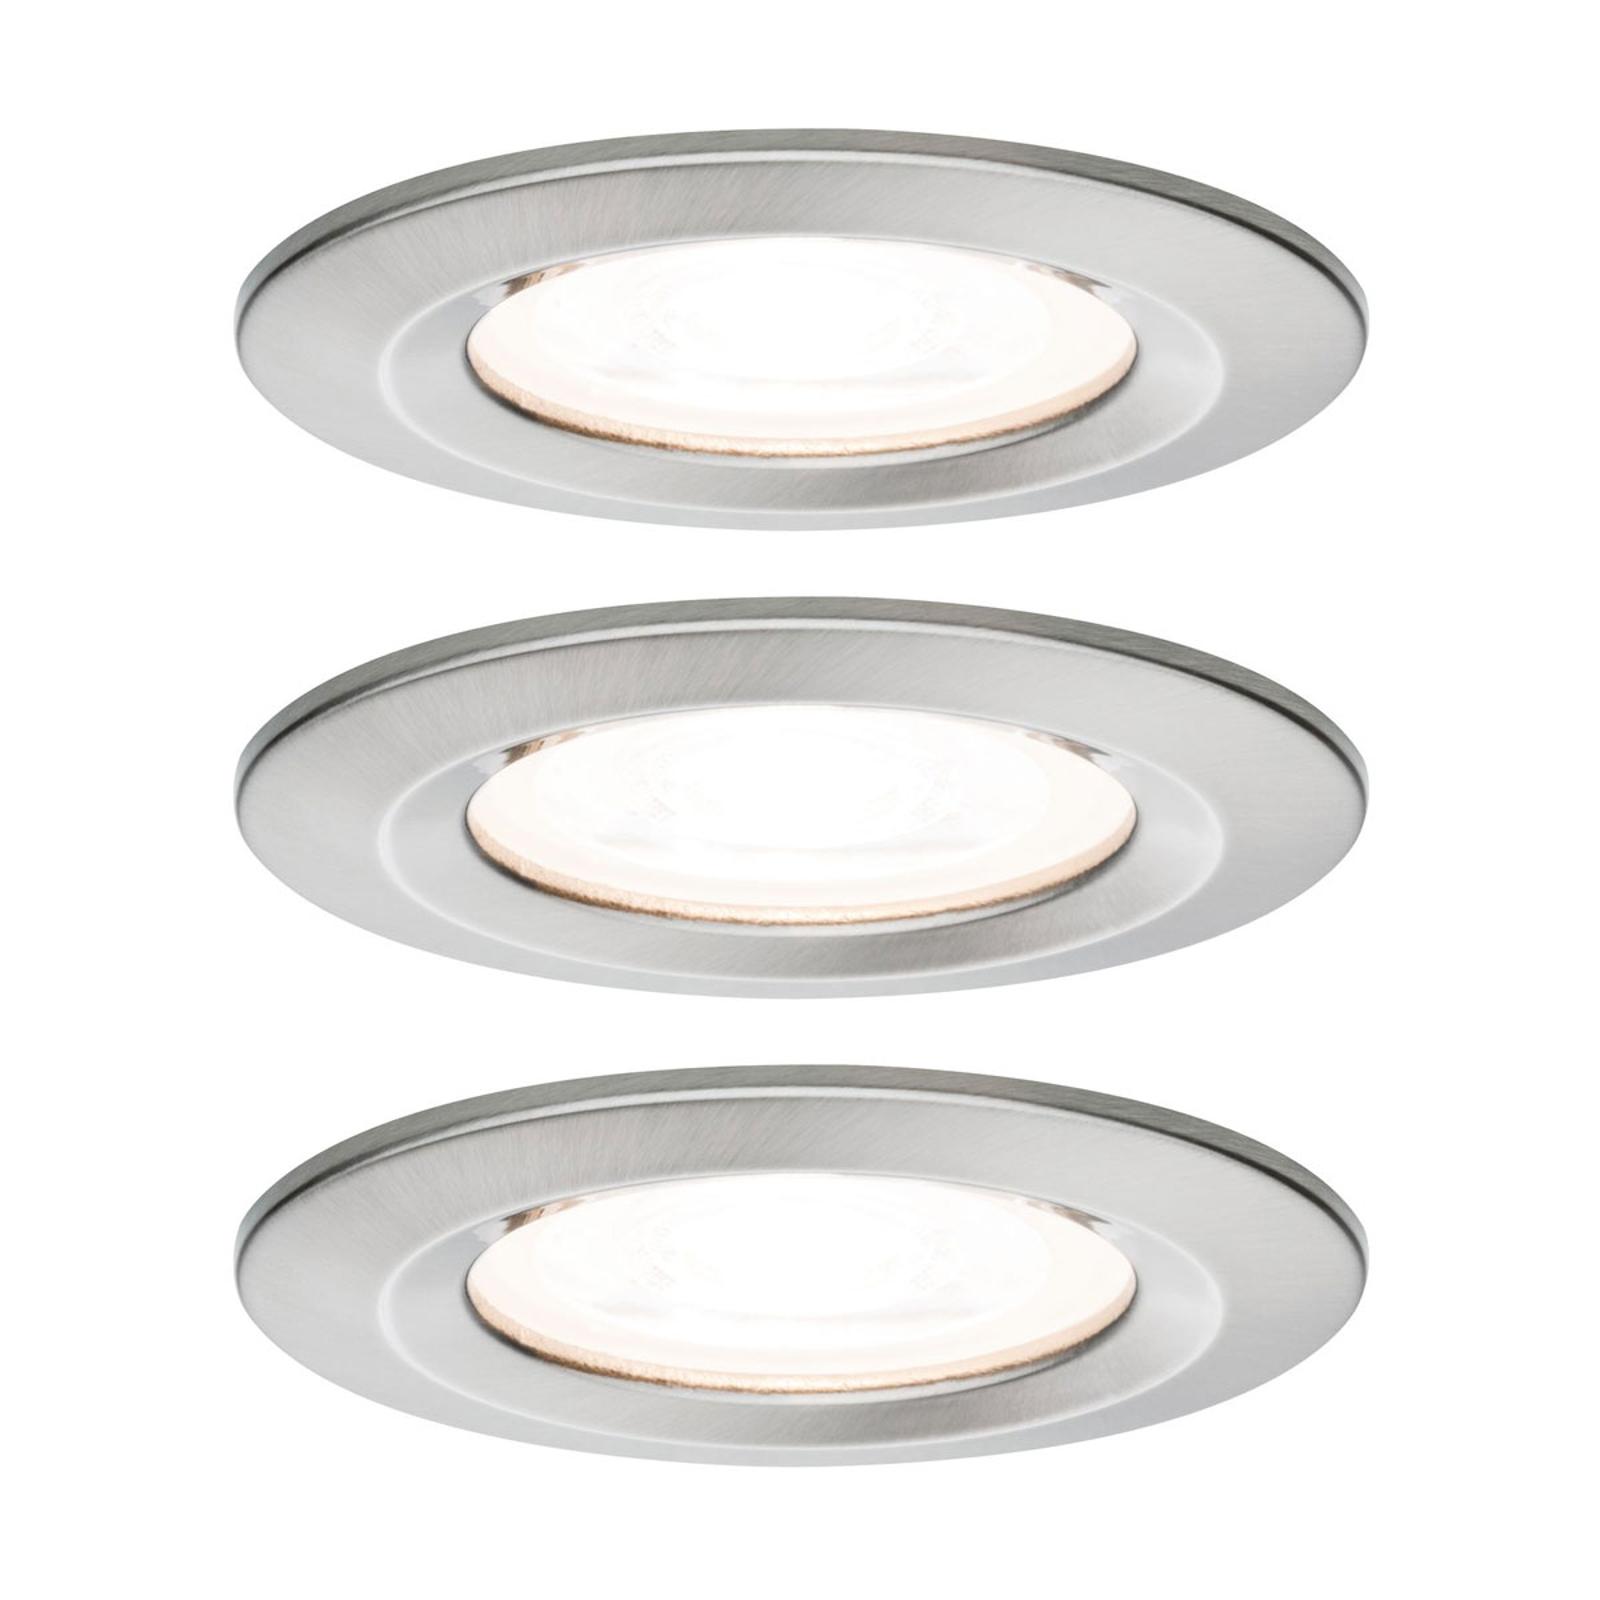 Paulmann Nova 3 faretti LED tondi, IP44, ferro Illuminazione per interni